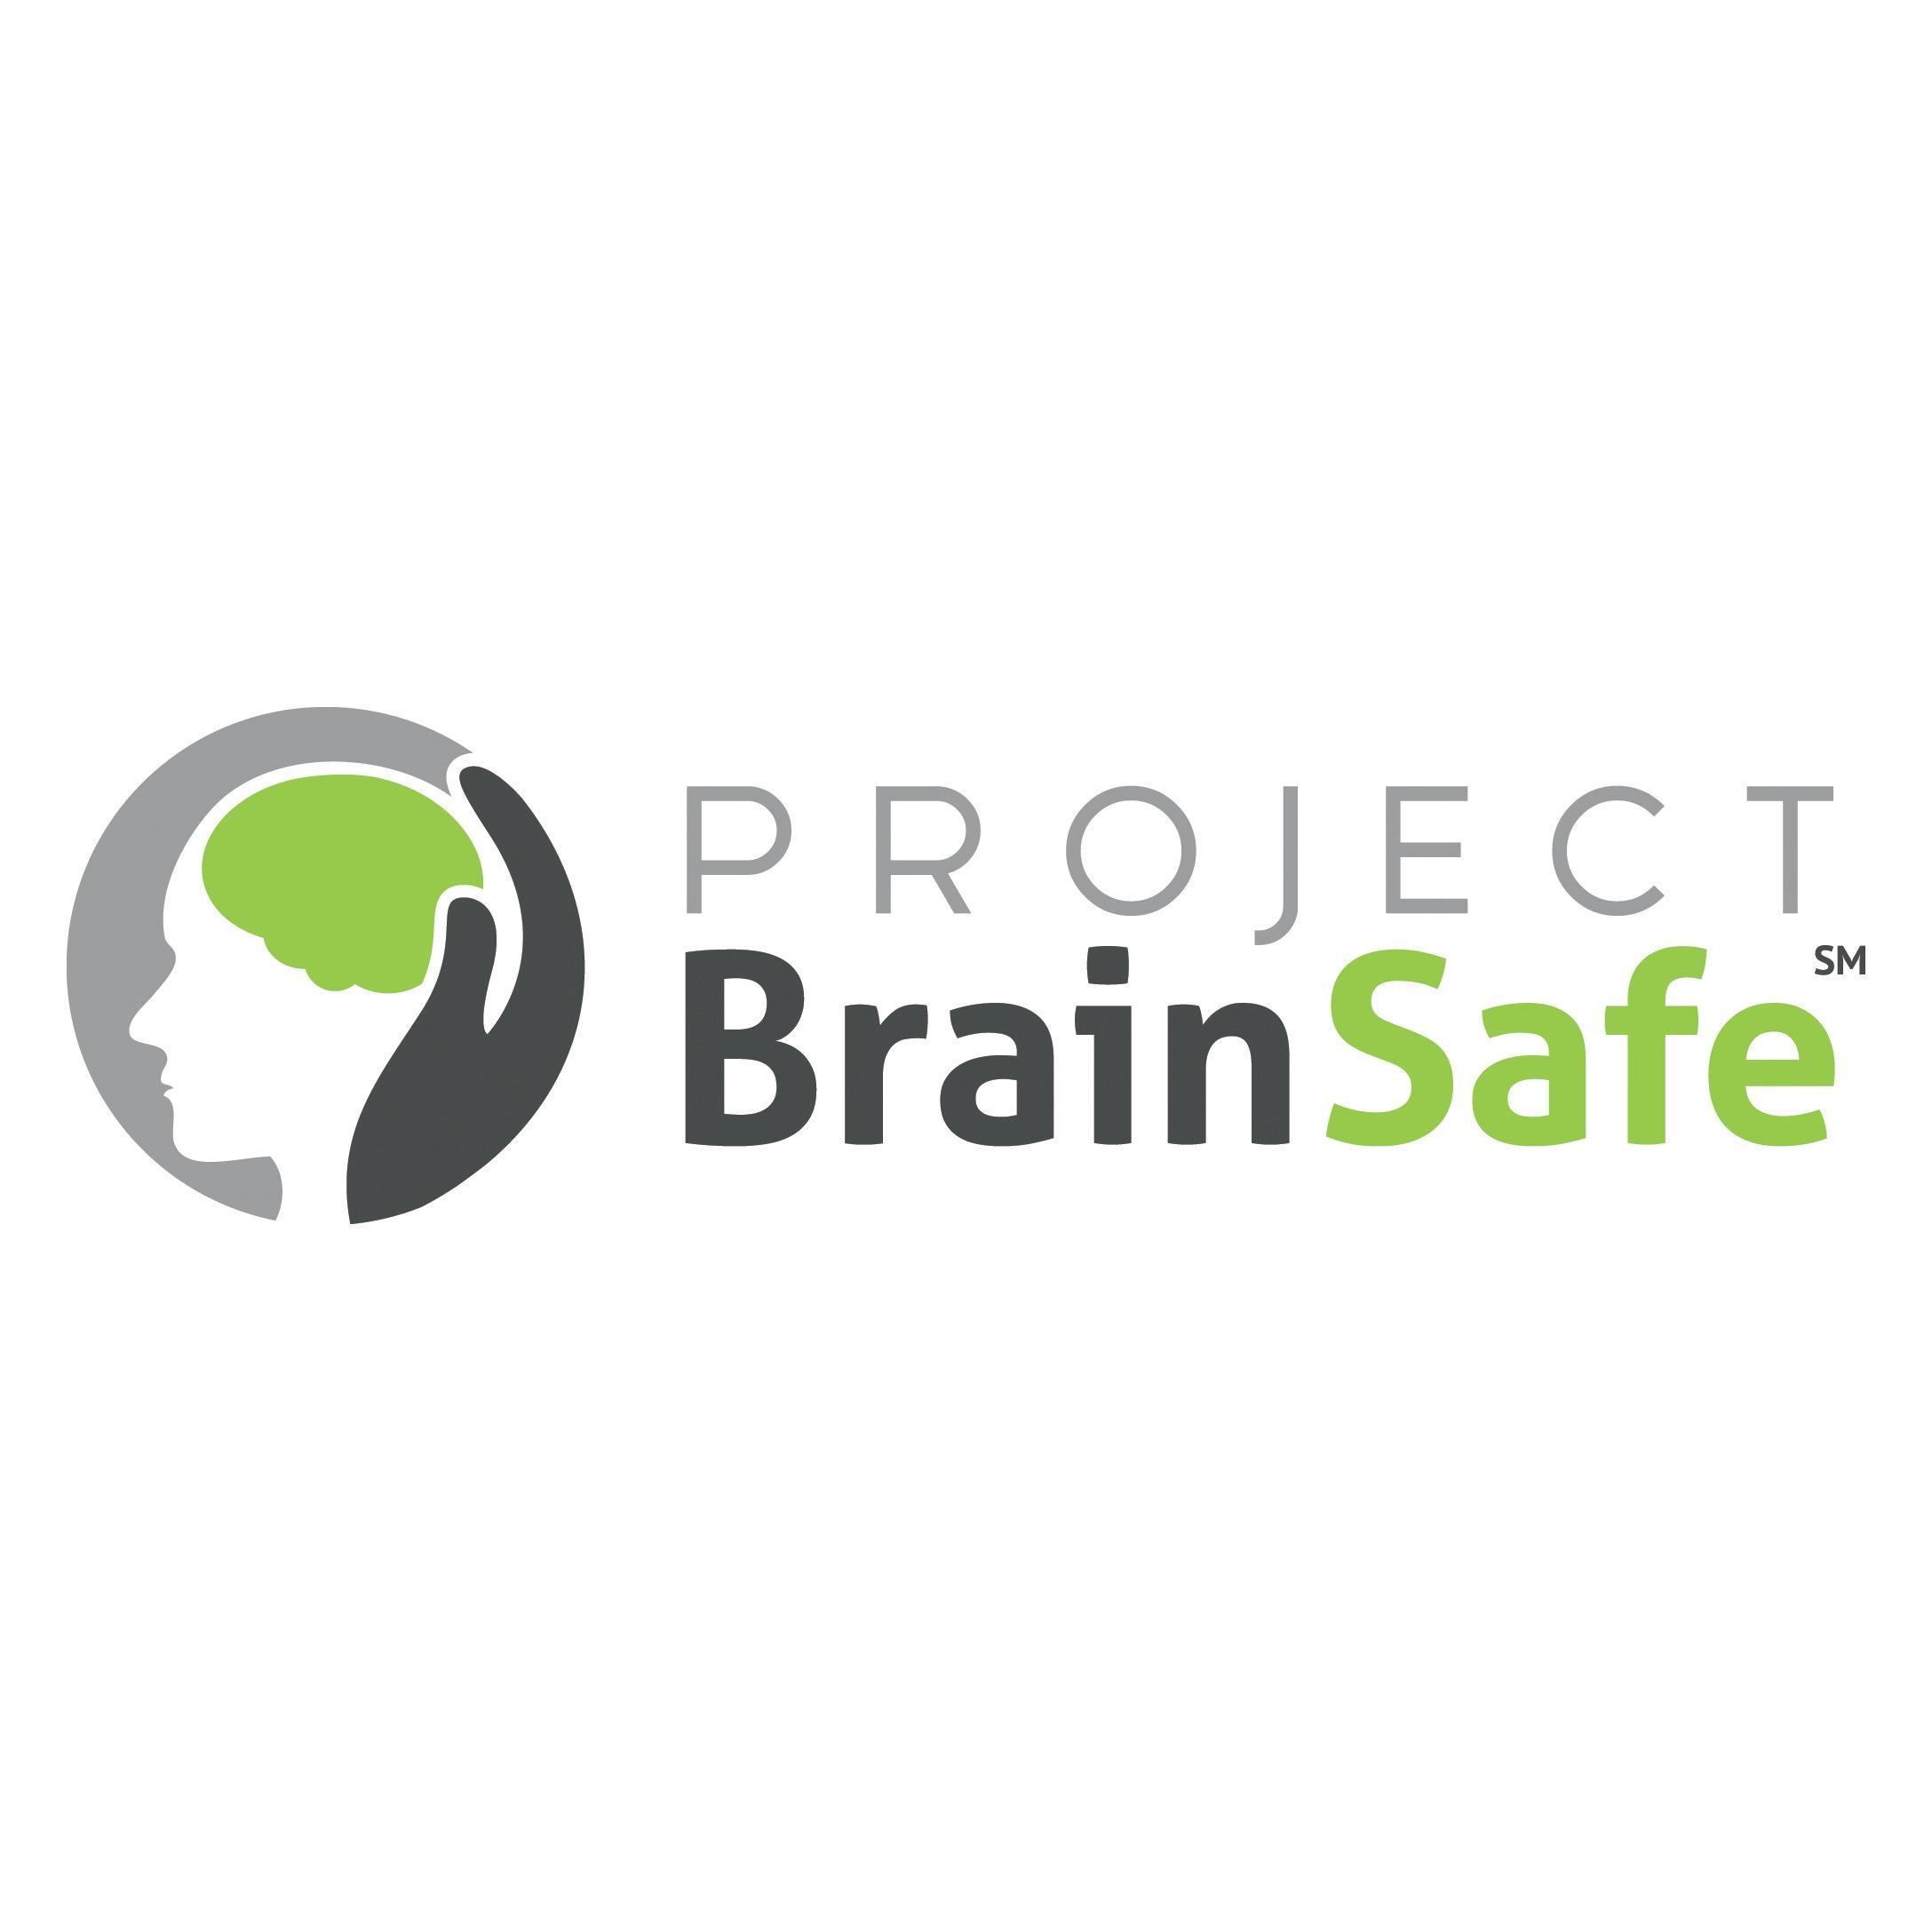 Project BrainSafe